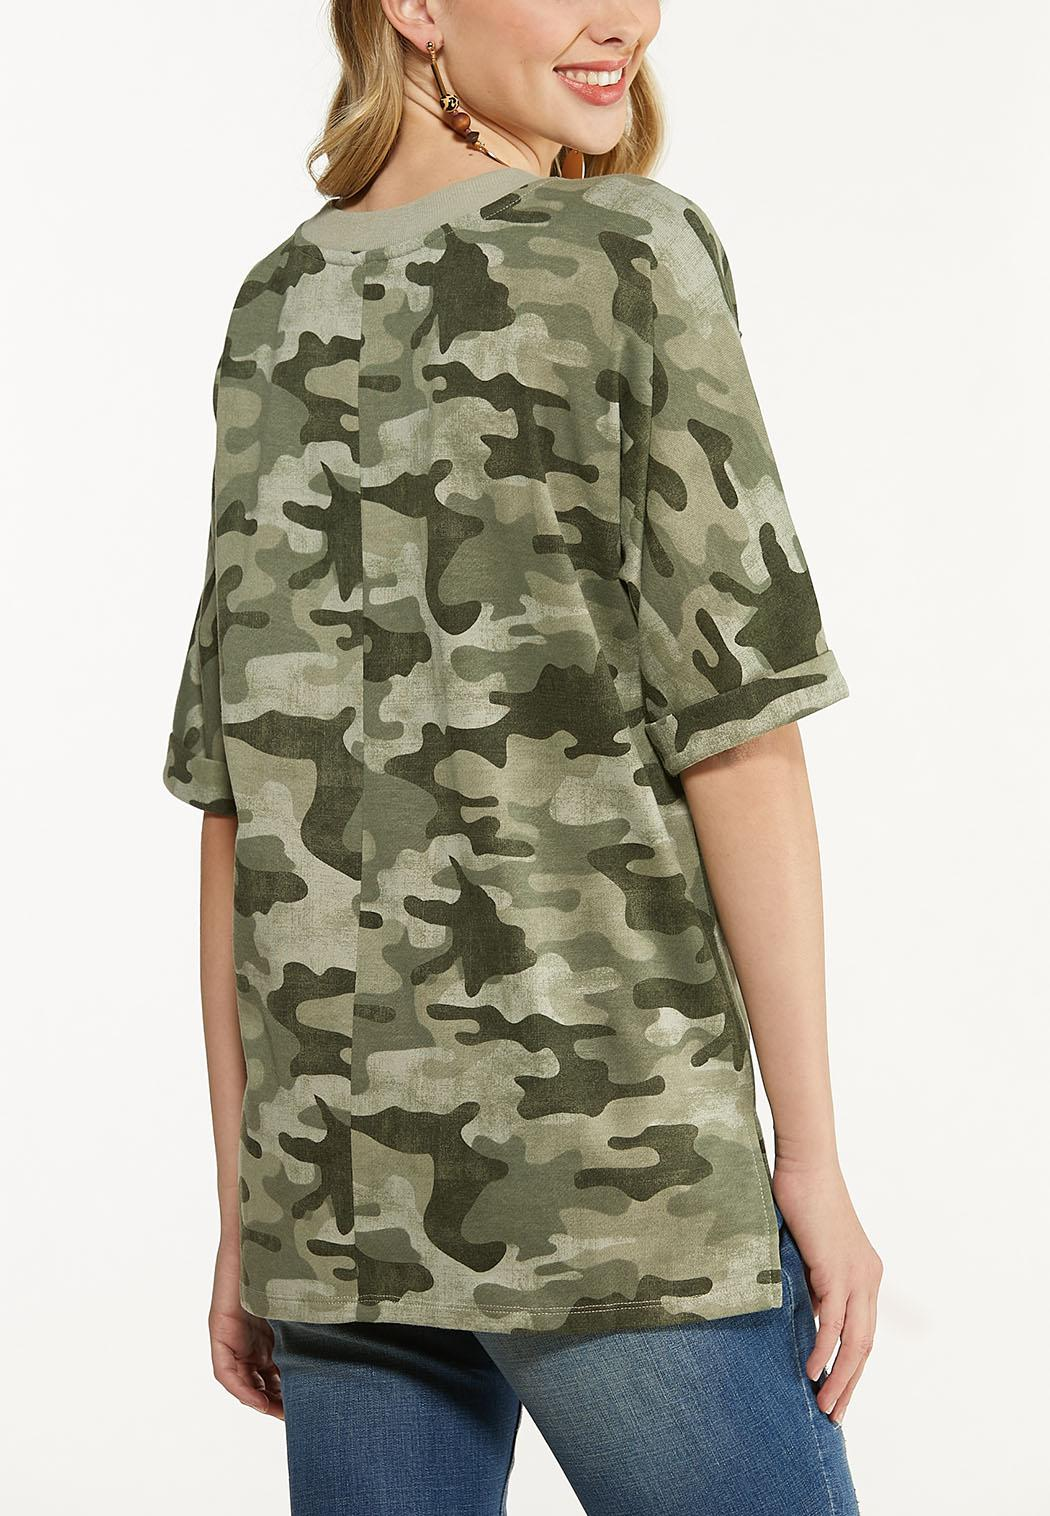 Plus Size Distressed Camo Top (Item #44568192)